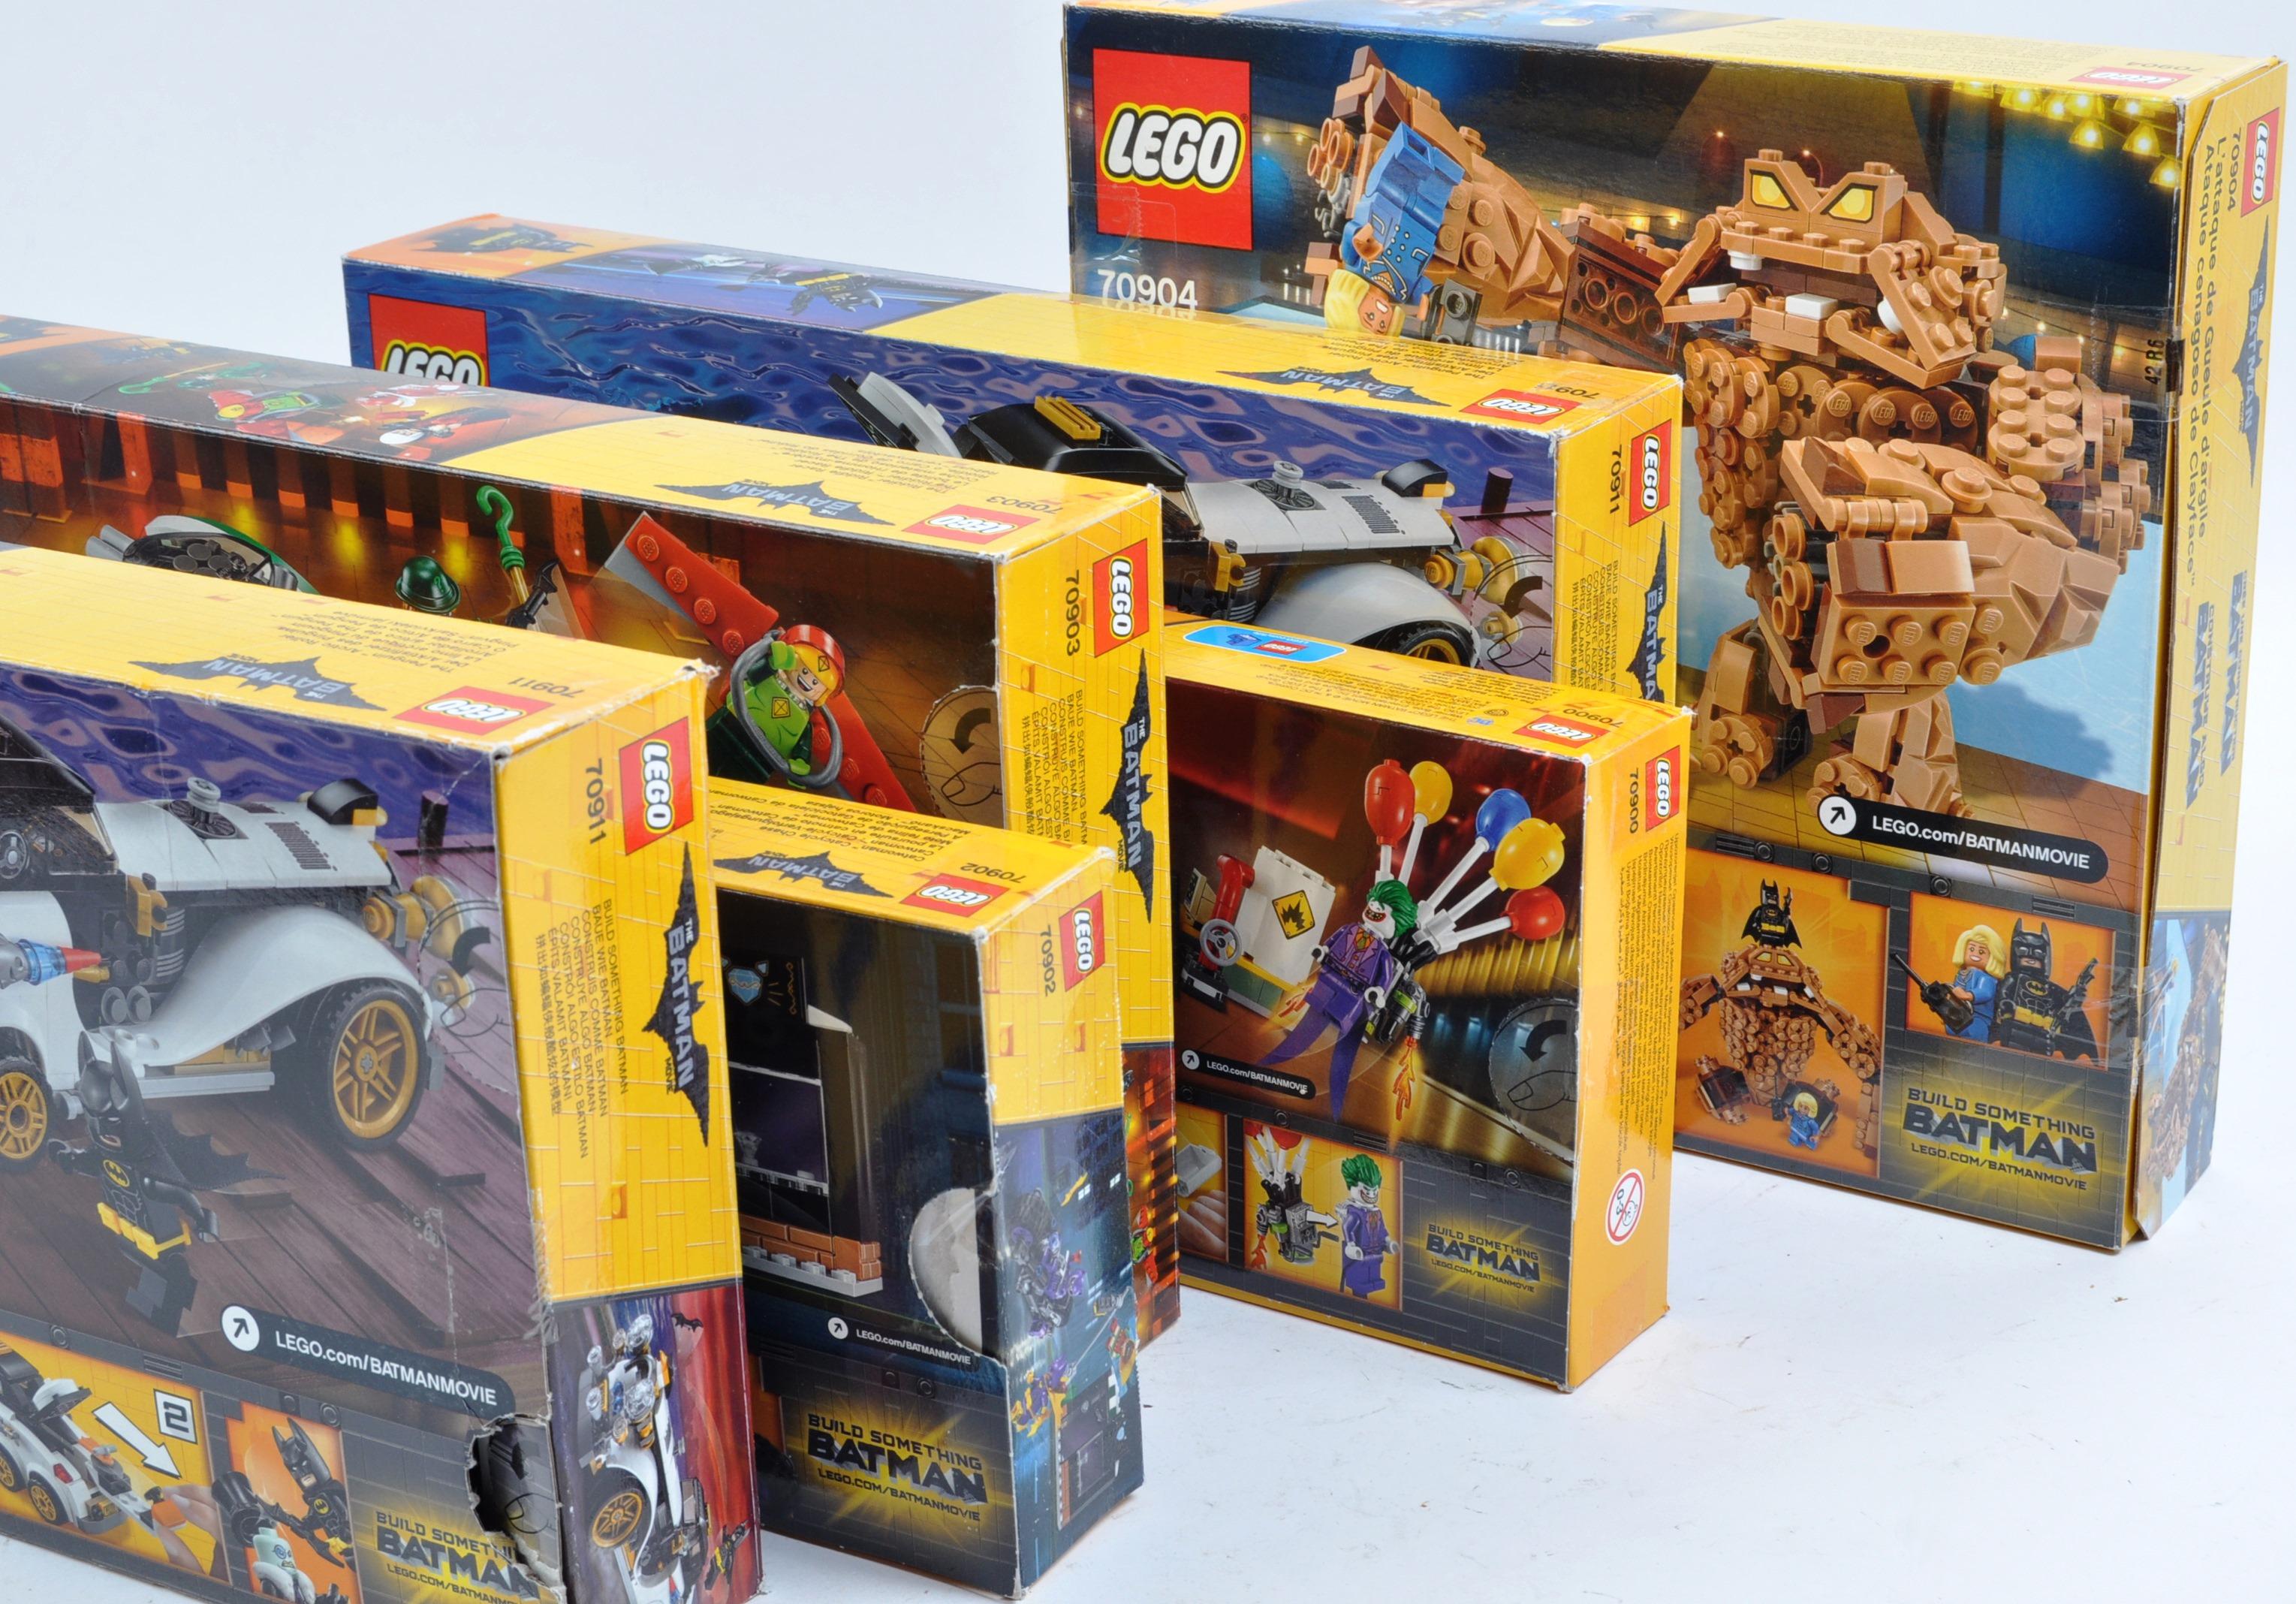 LEGO SETS - THE BATMAN MOVIE - Image 6 of 6